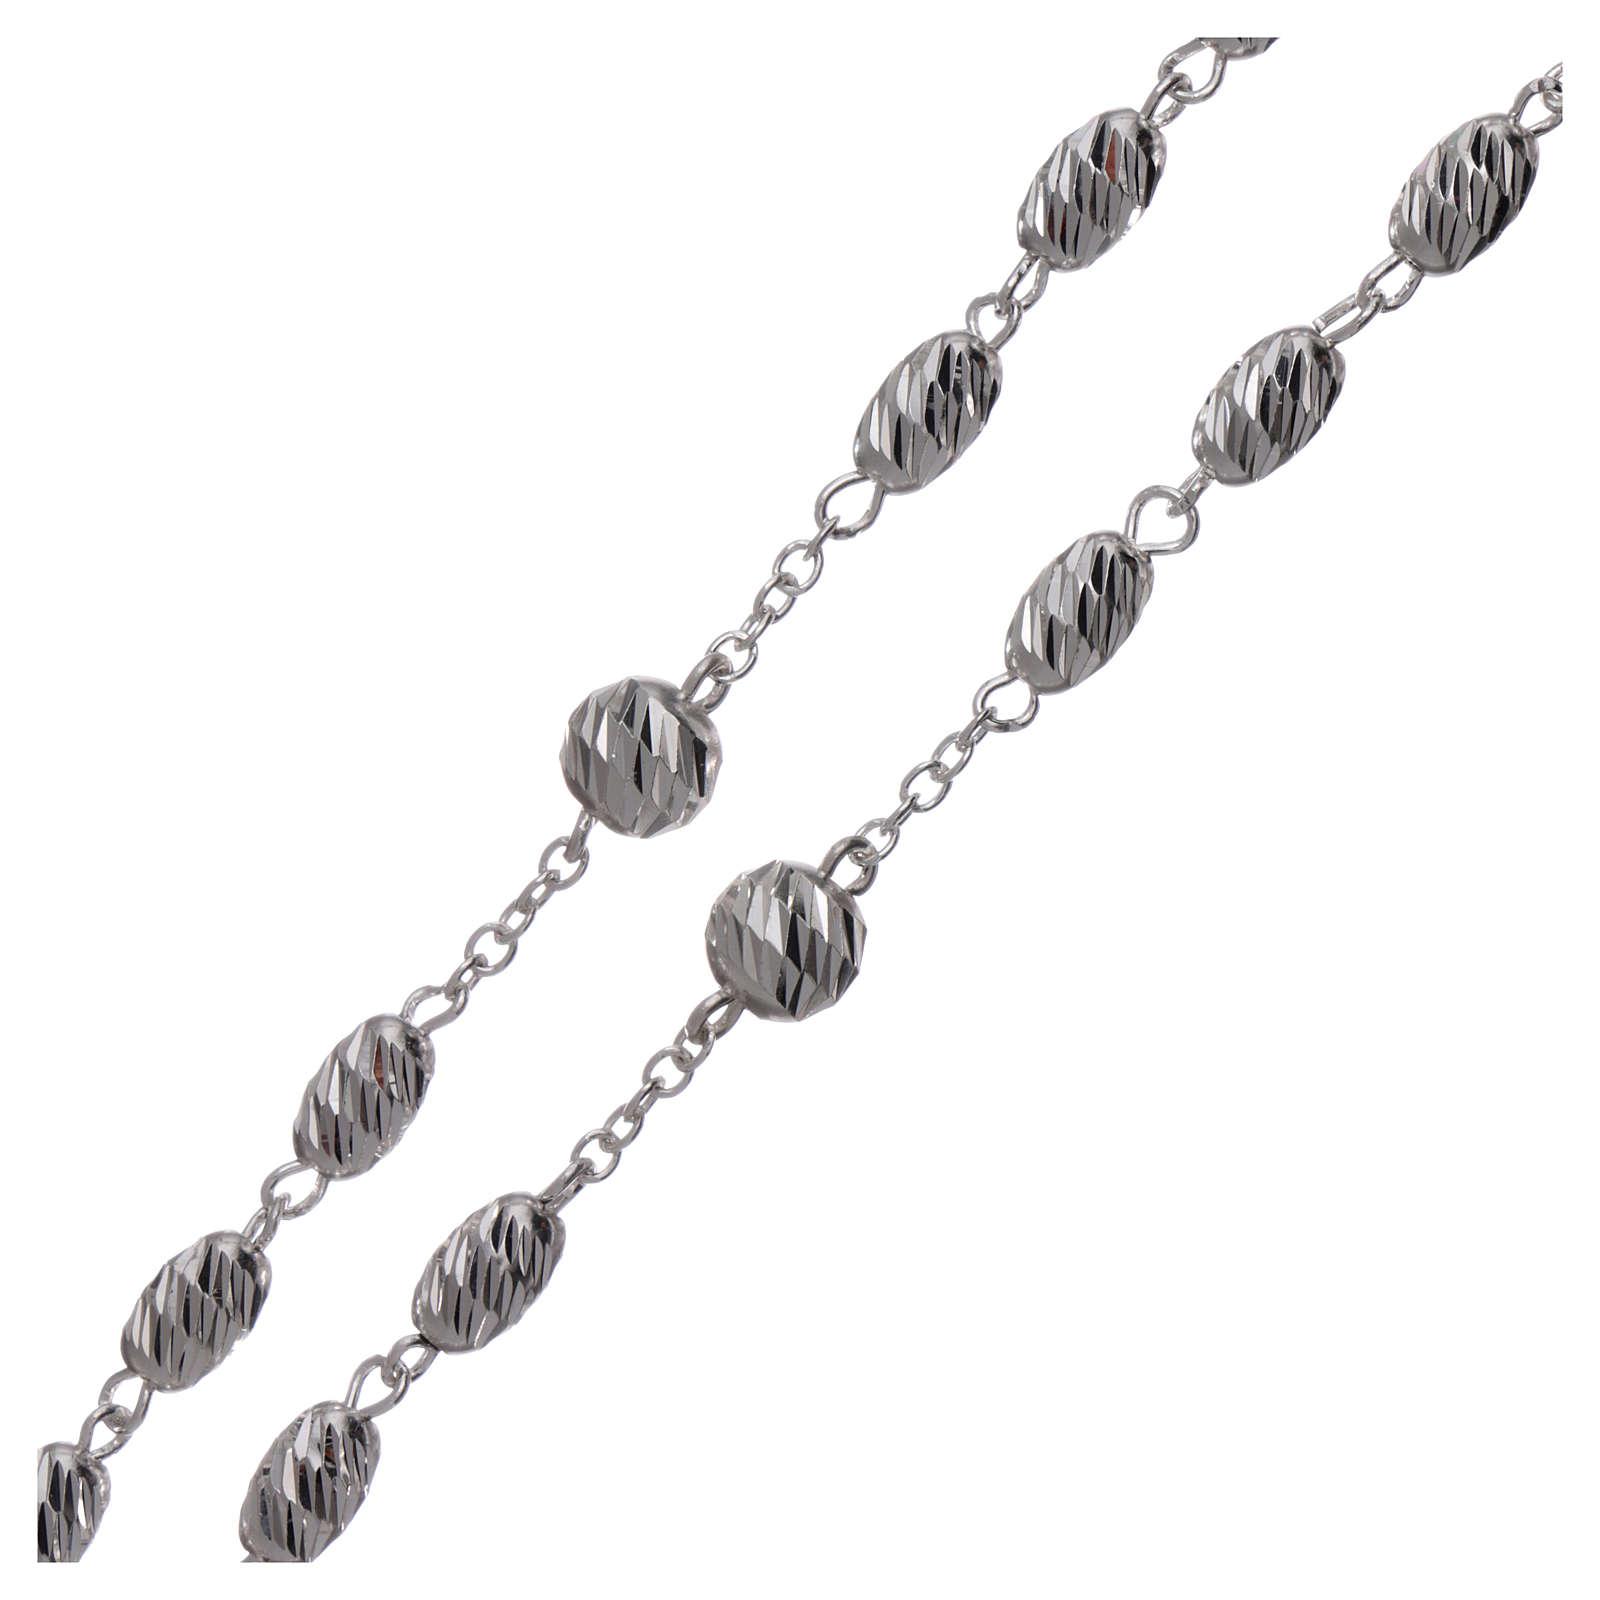 Terço prata 925 contas espiga 7x5 mm 4